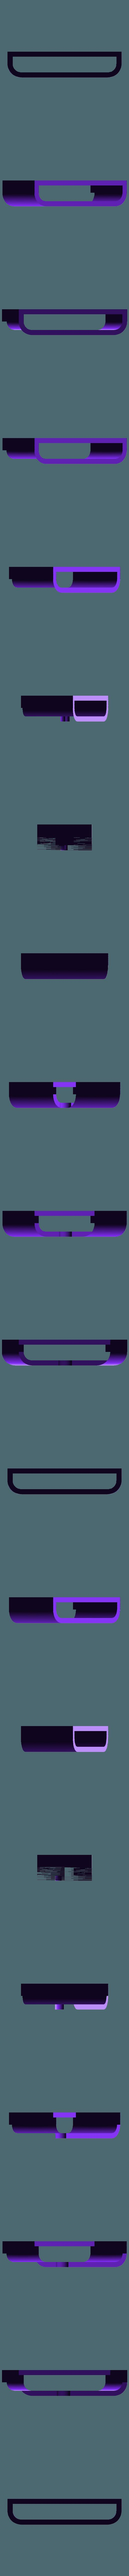 wctm-sensor-cover.stl Download free STL file Wearable Temperature Monitor • 3D printing object, Adafruit